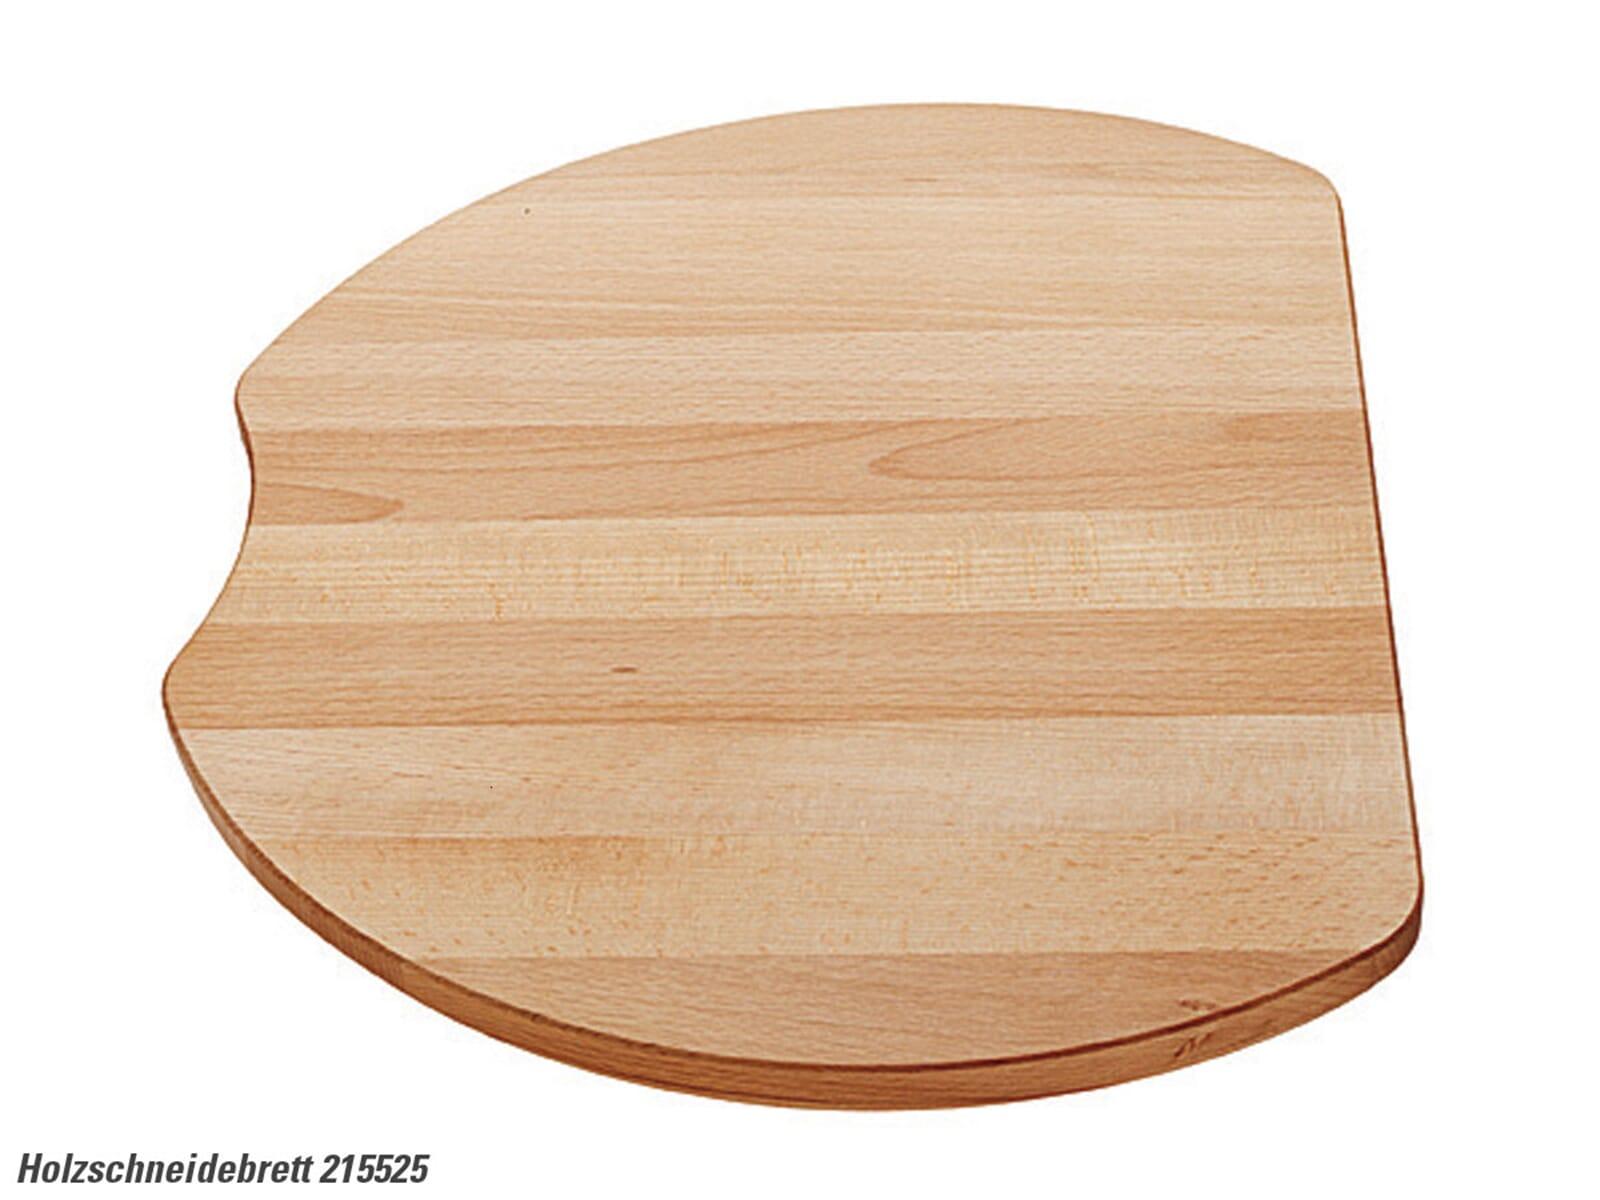 Blanco 215 525 Holzschneidebrett Buche